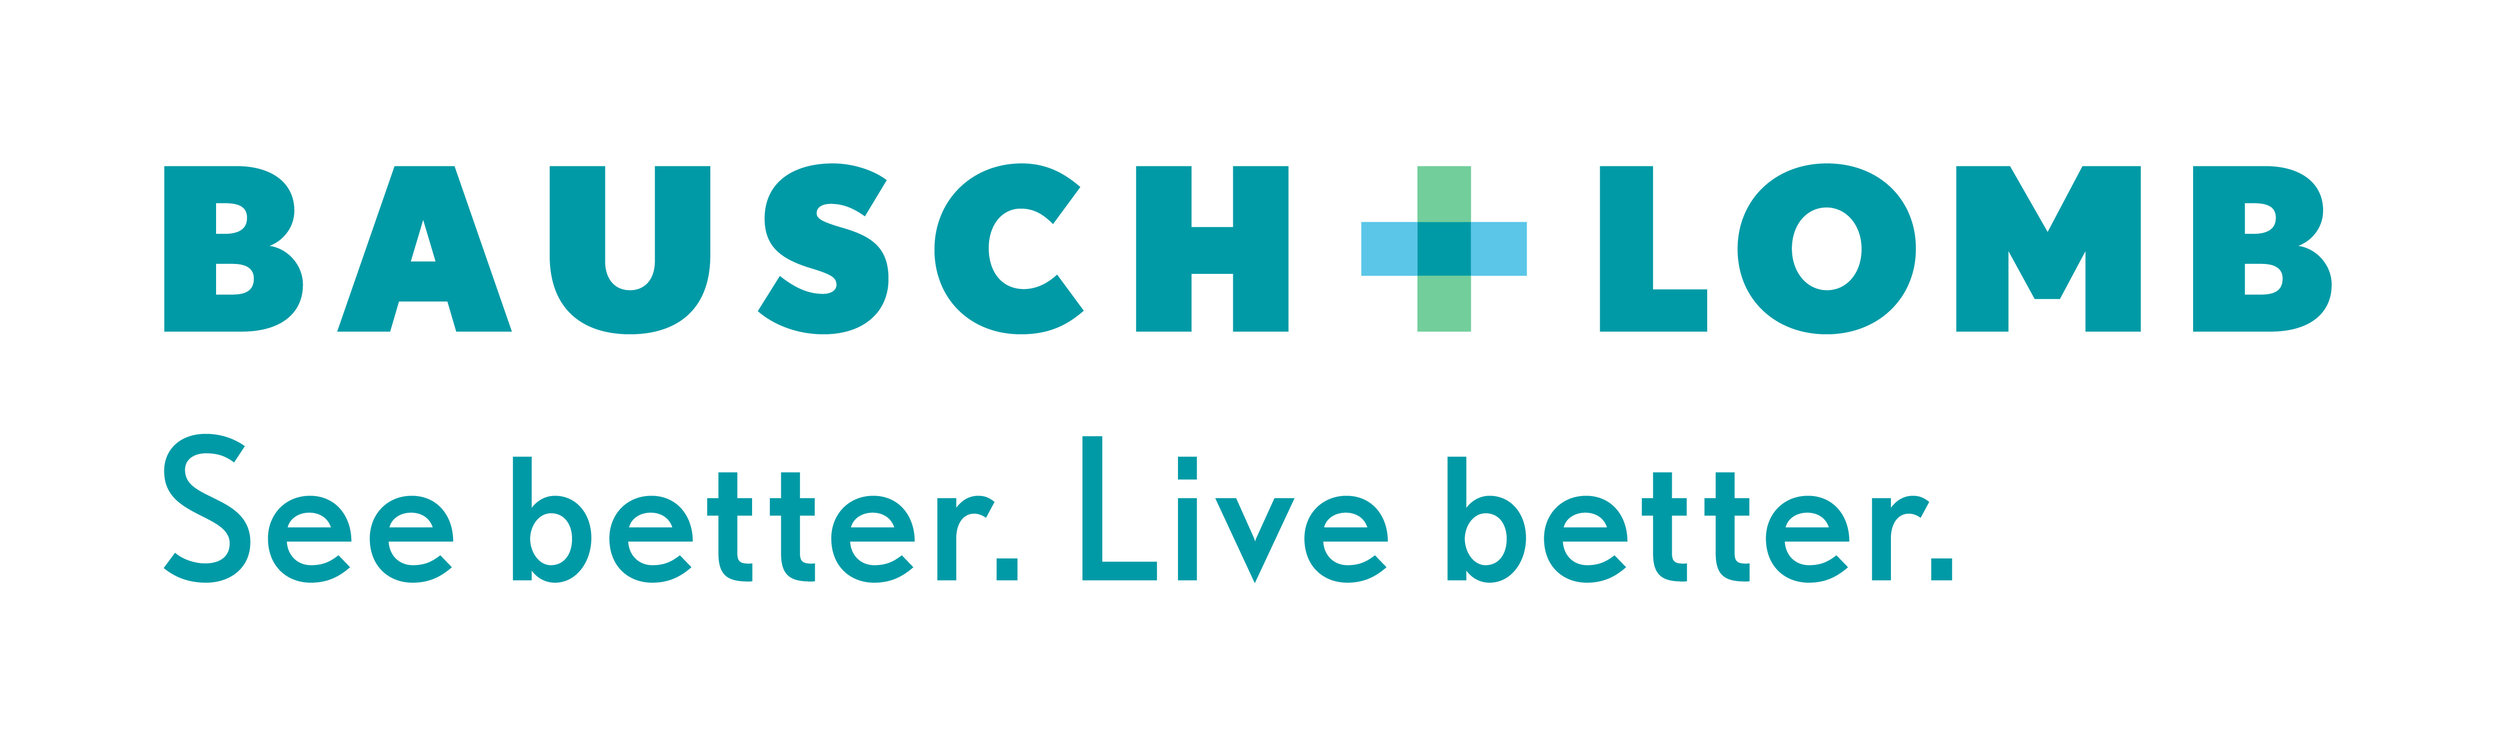 Bausch-Lomb-logo-w-tagline.jpg